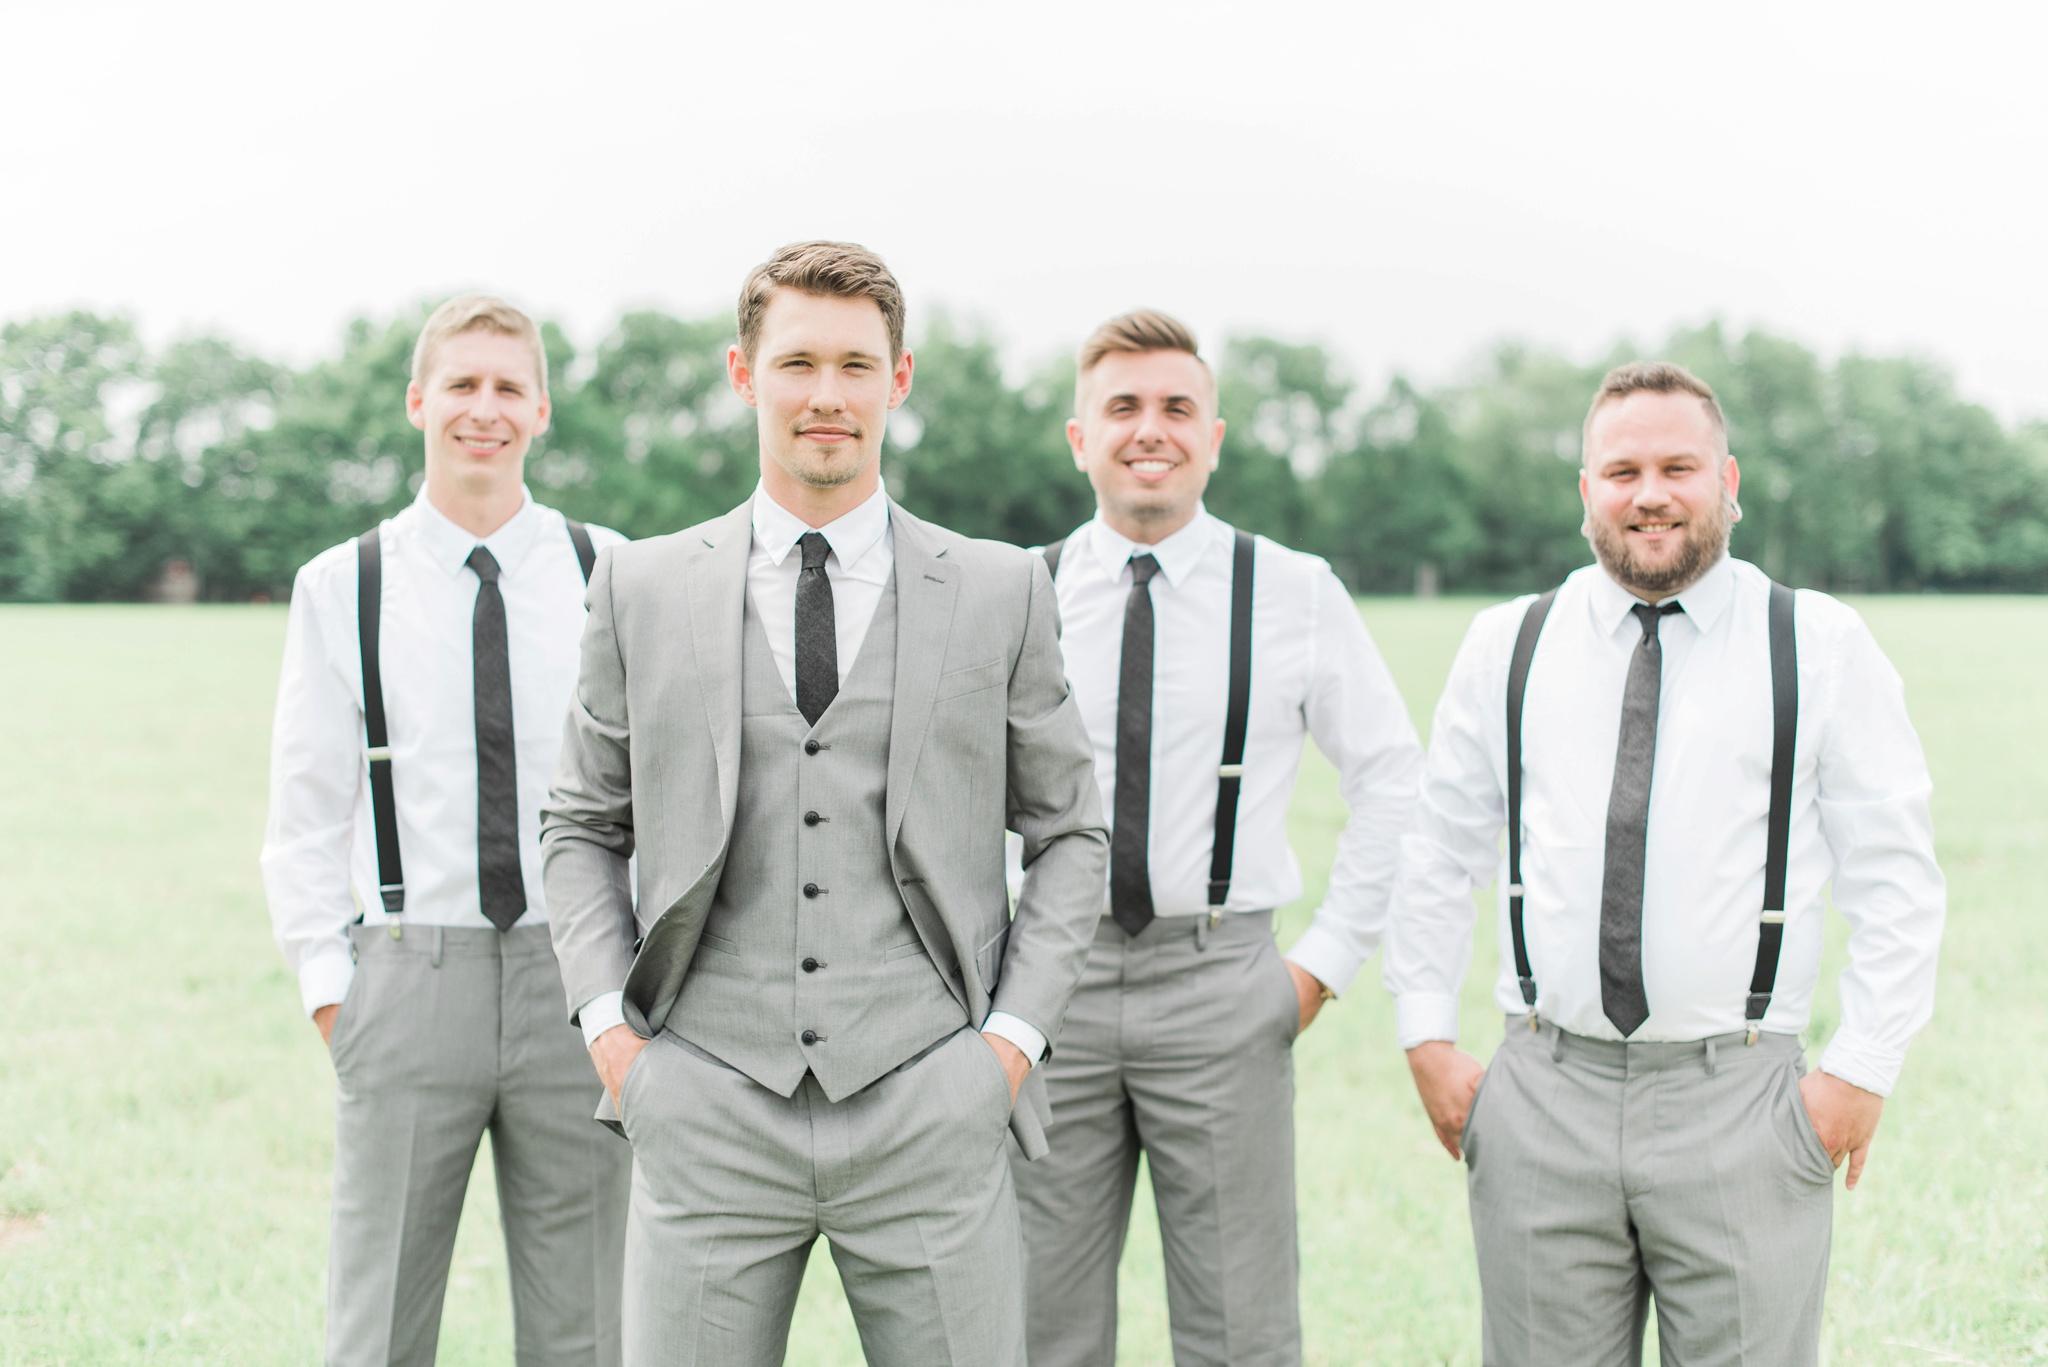 niederman-farm-wedding-cincinnati-ohio-photographer_0038.jpg